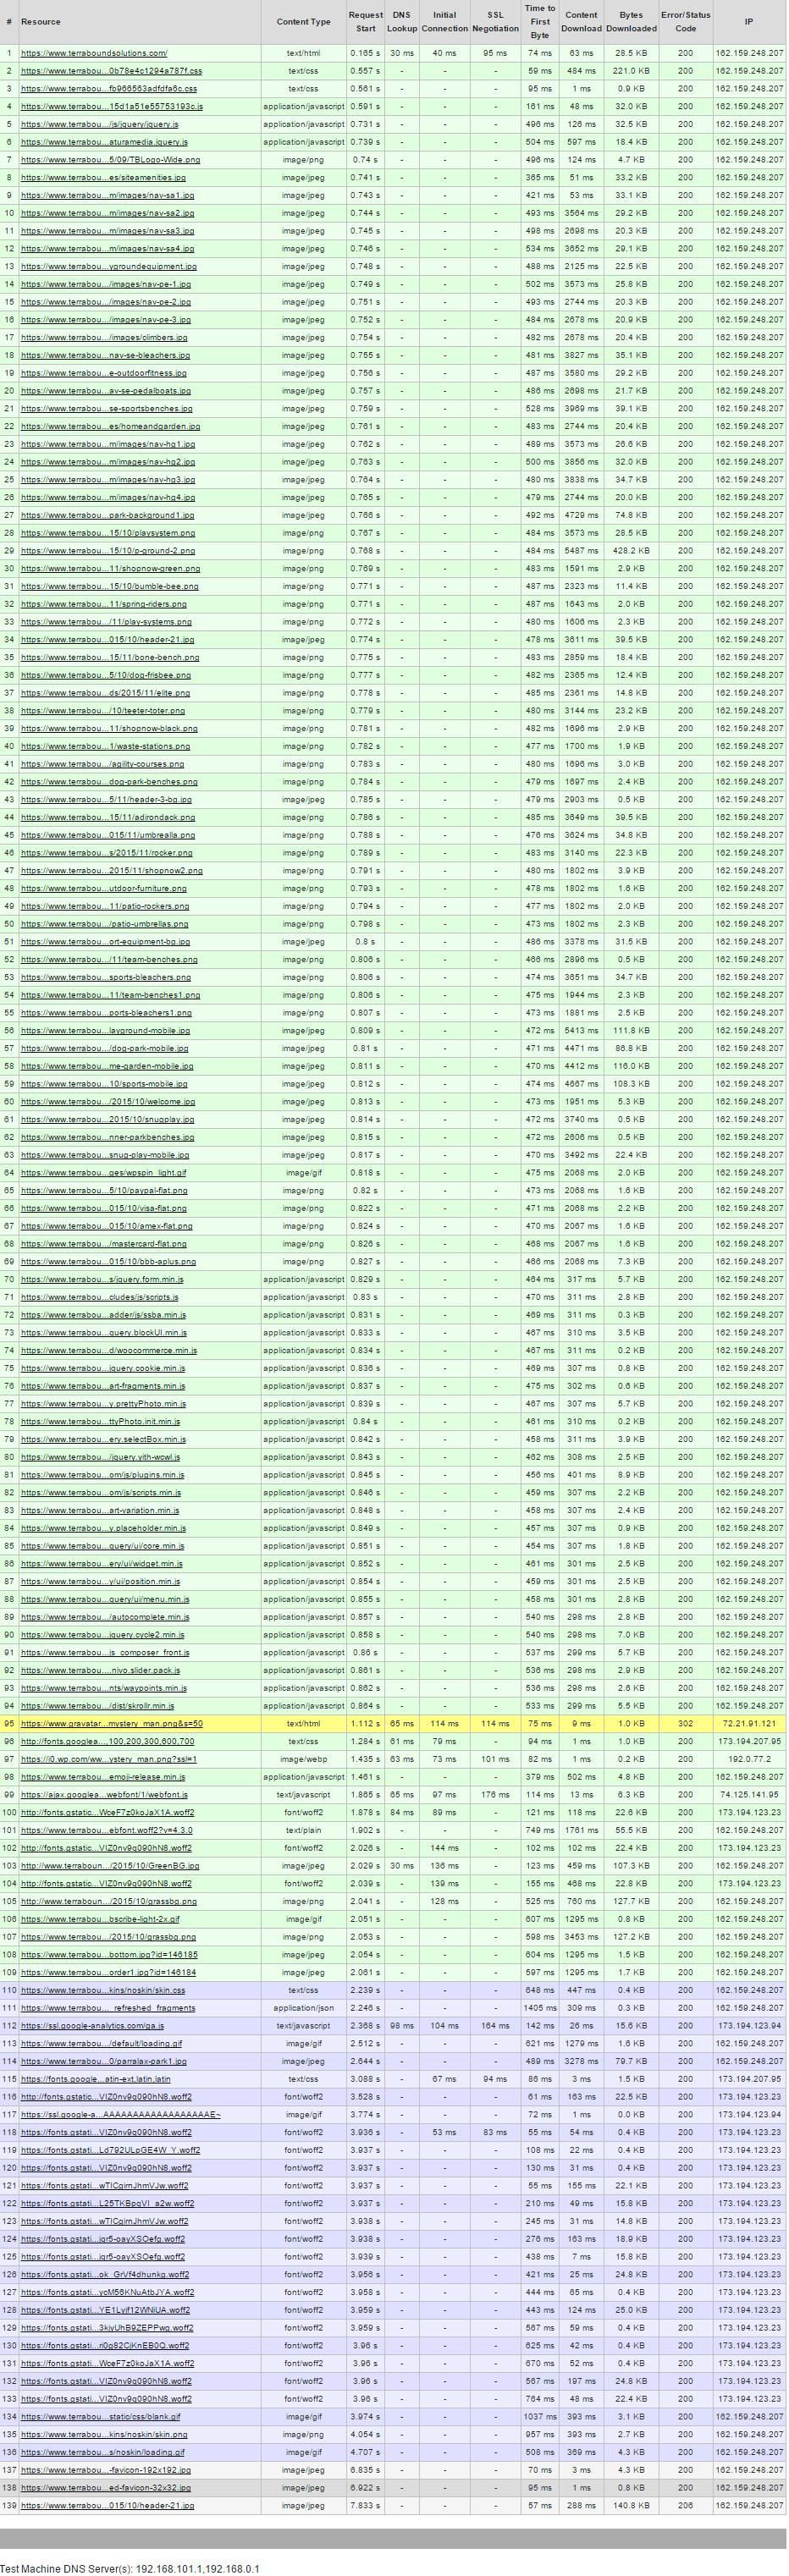 terra request details after